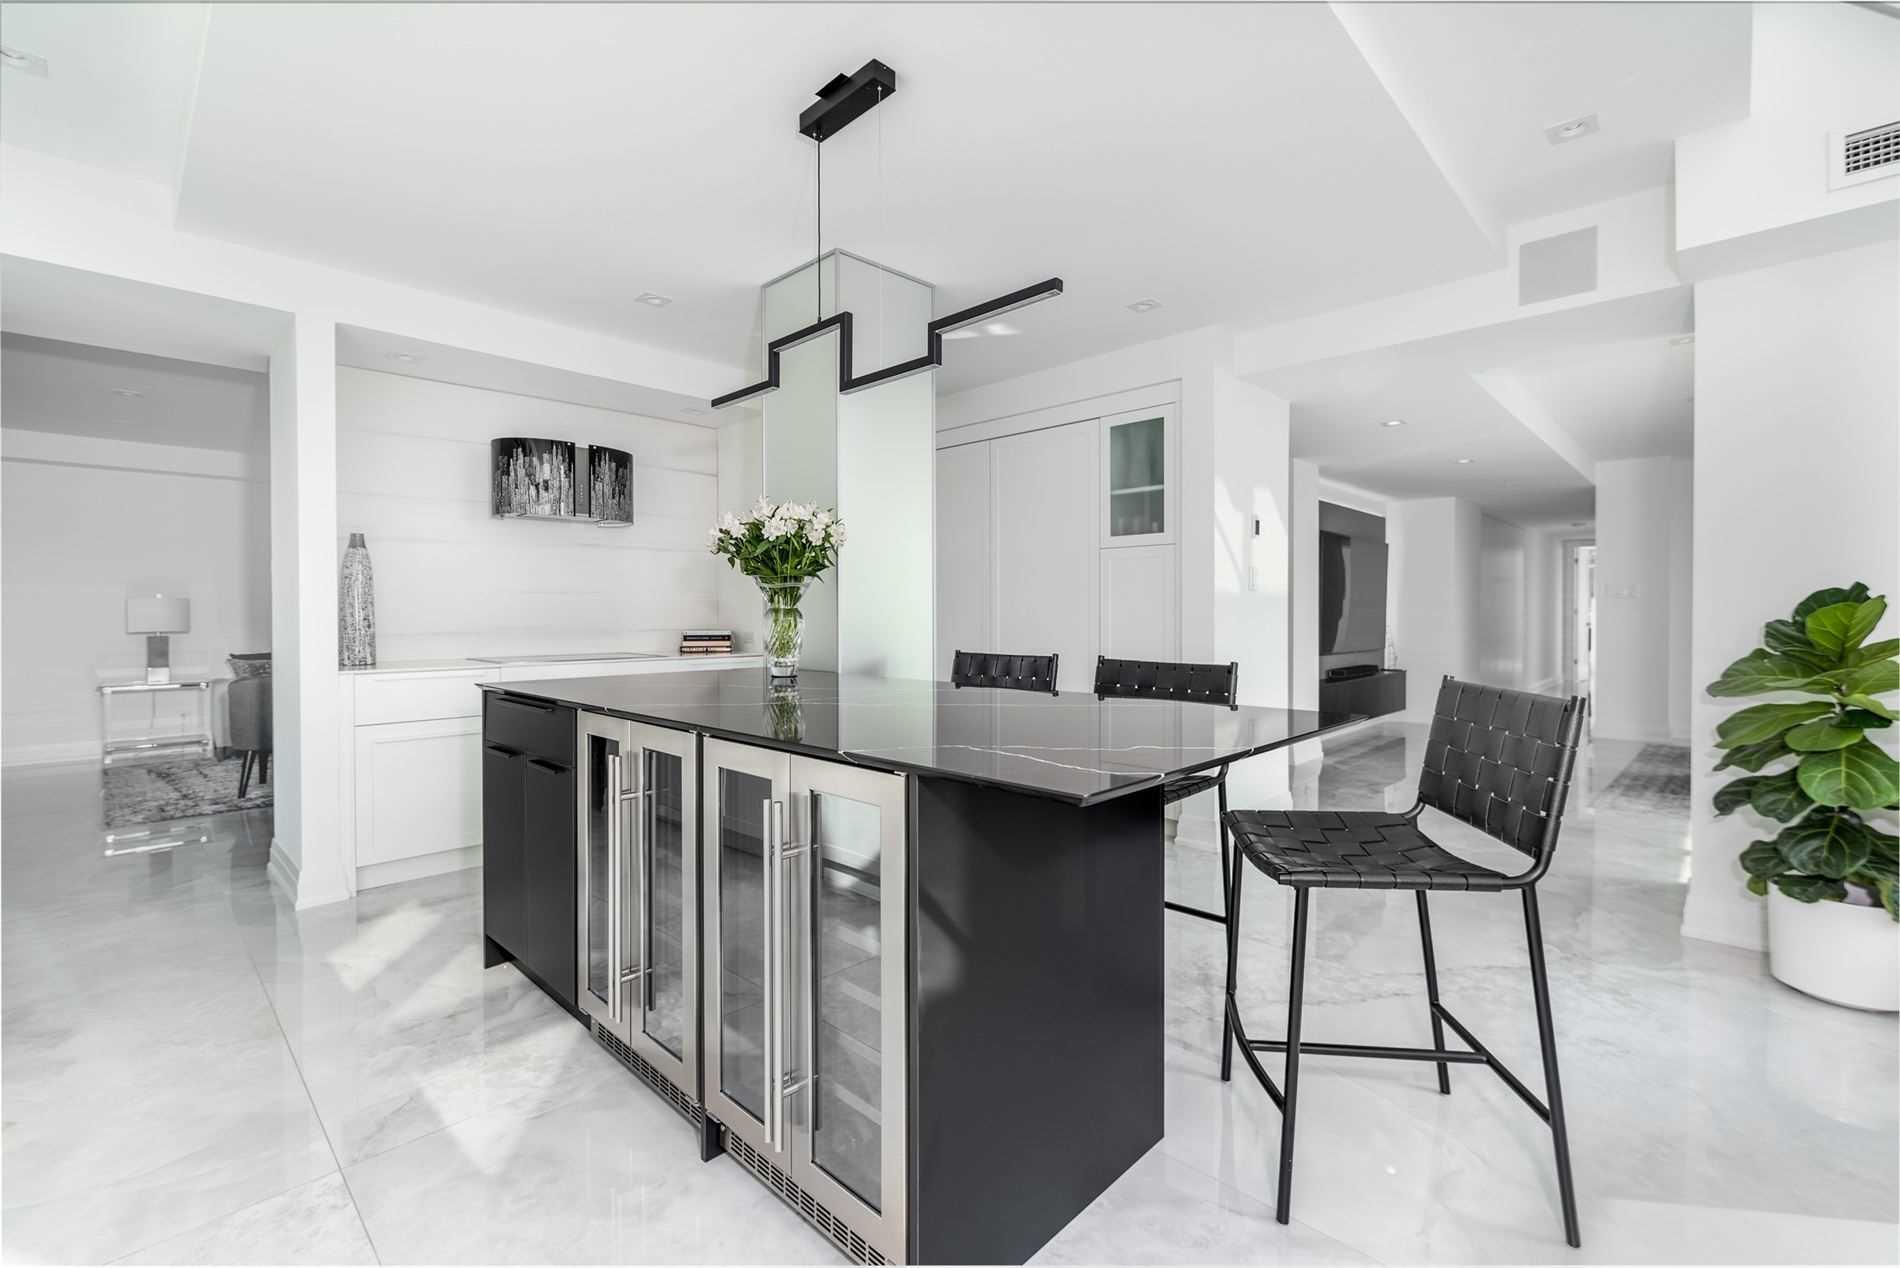 Condo Apt For Sale In Toronto , 2 Bedrooms Bedrooms, ,3 BathroomsBathrooms,Condo Apt,For Sale,Uph 1,Queens Quay